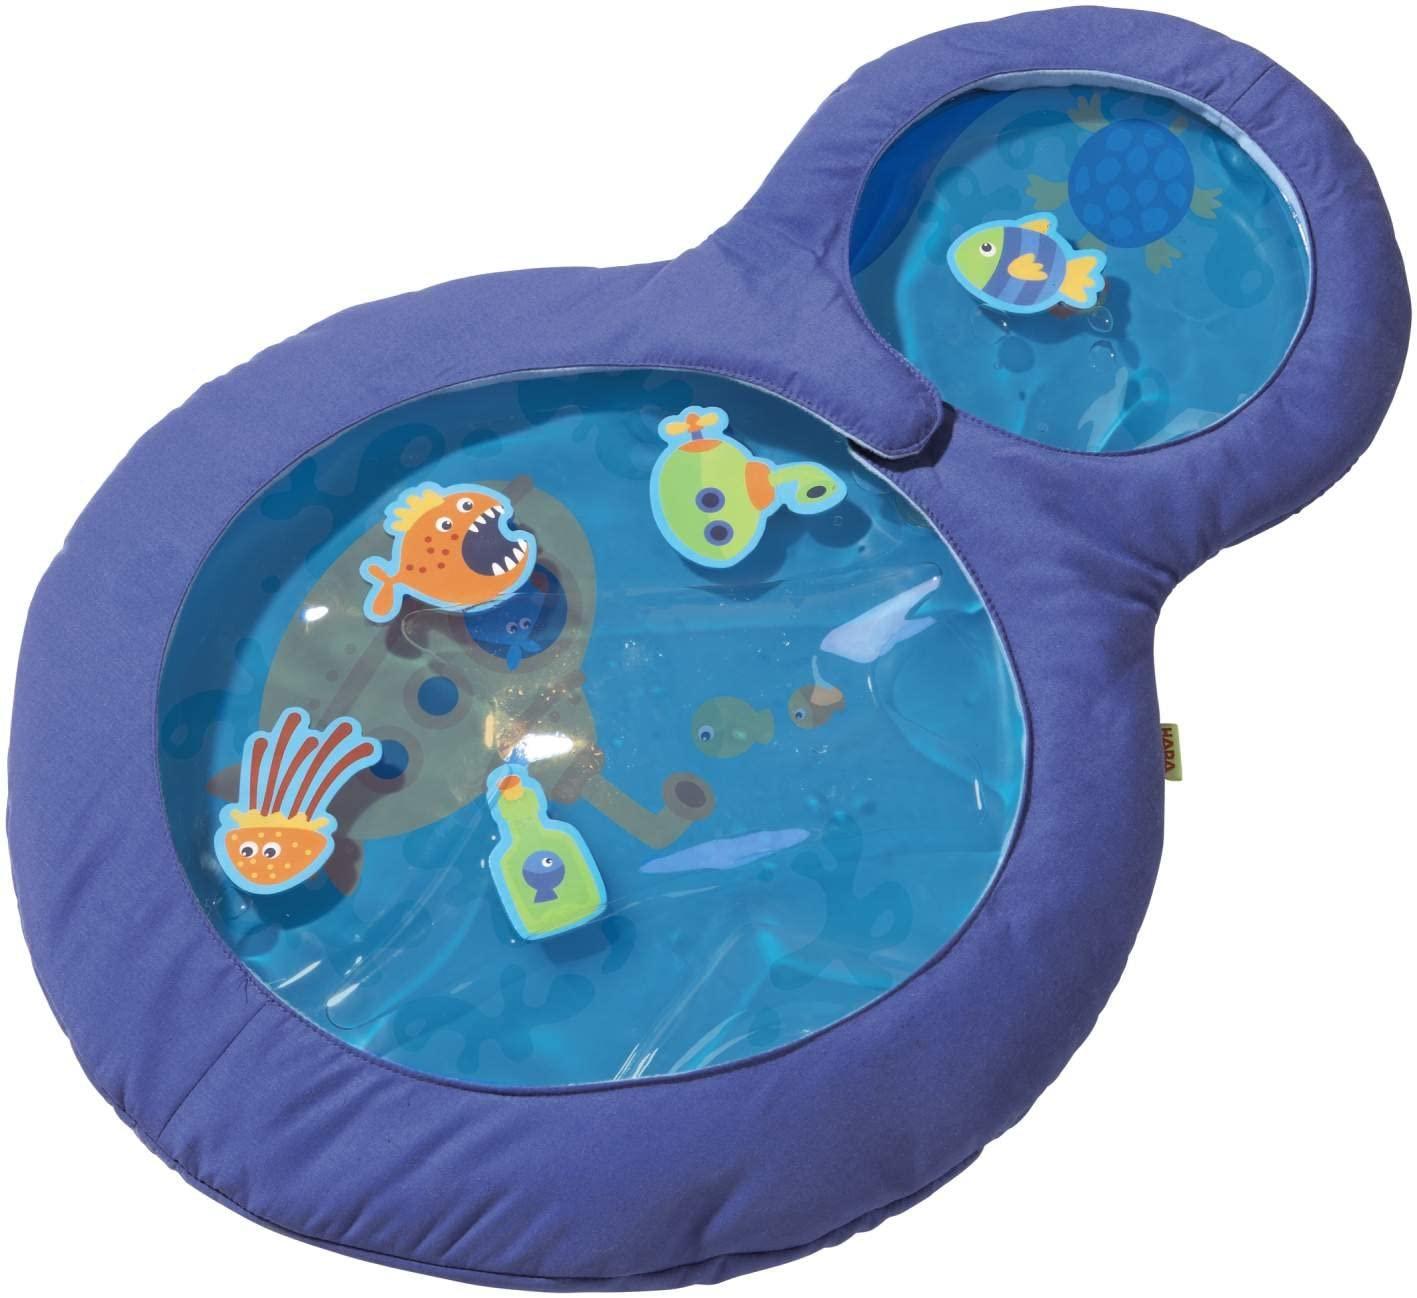 Tapis de jeu à eau : Eveil aquatique